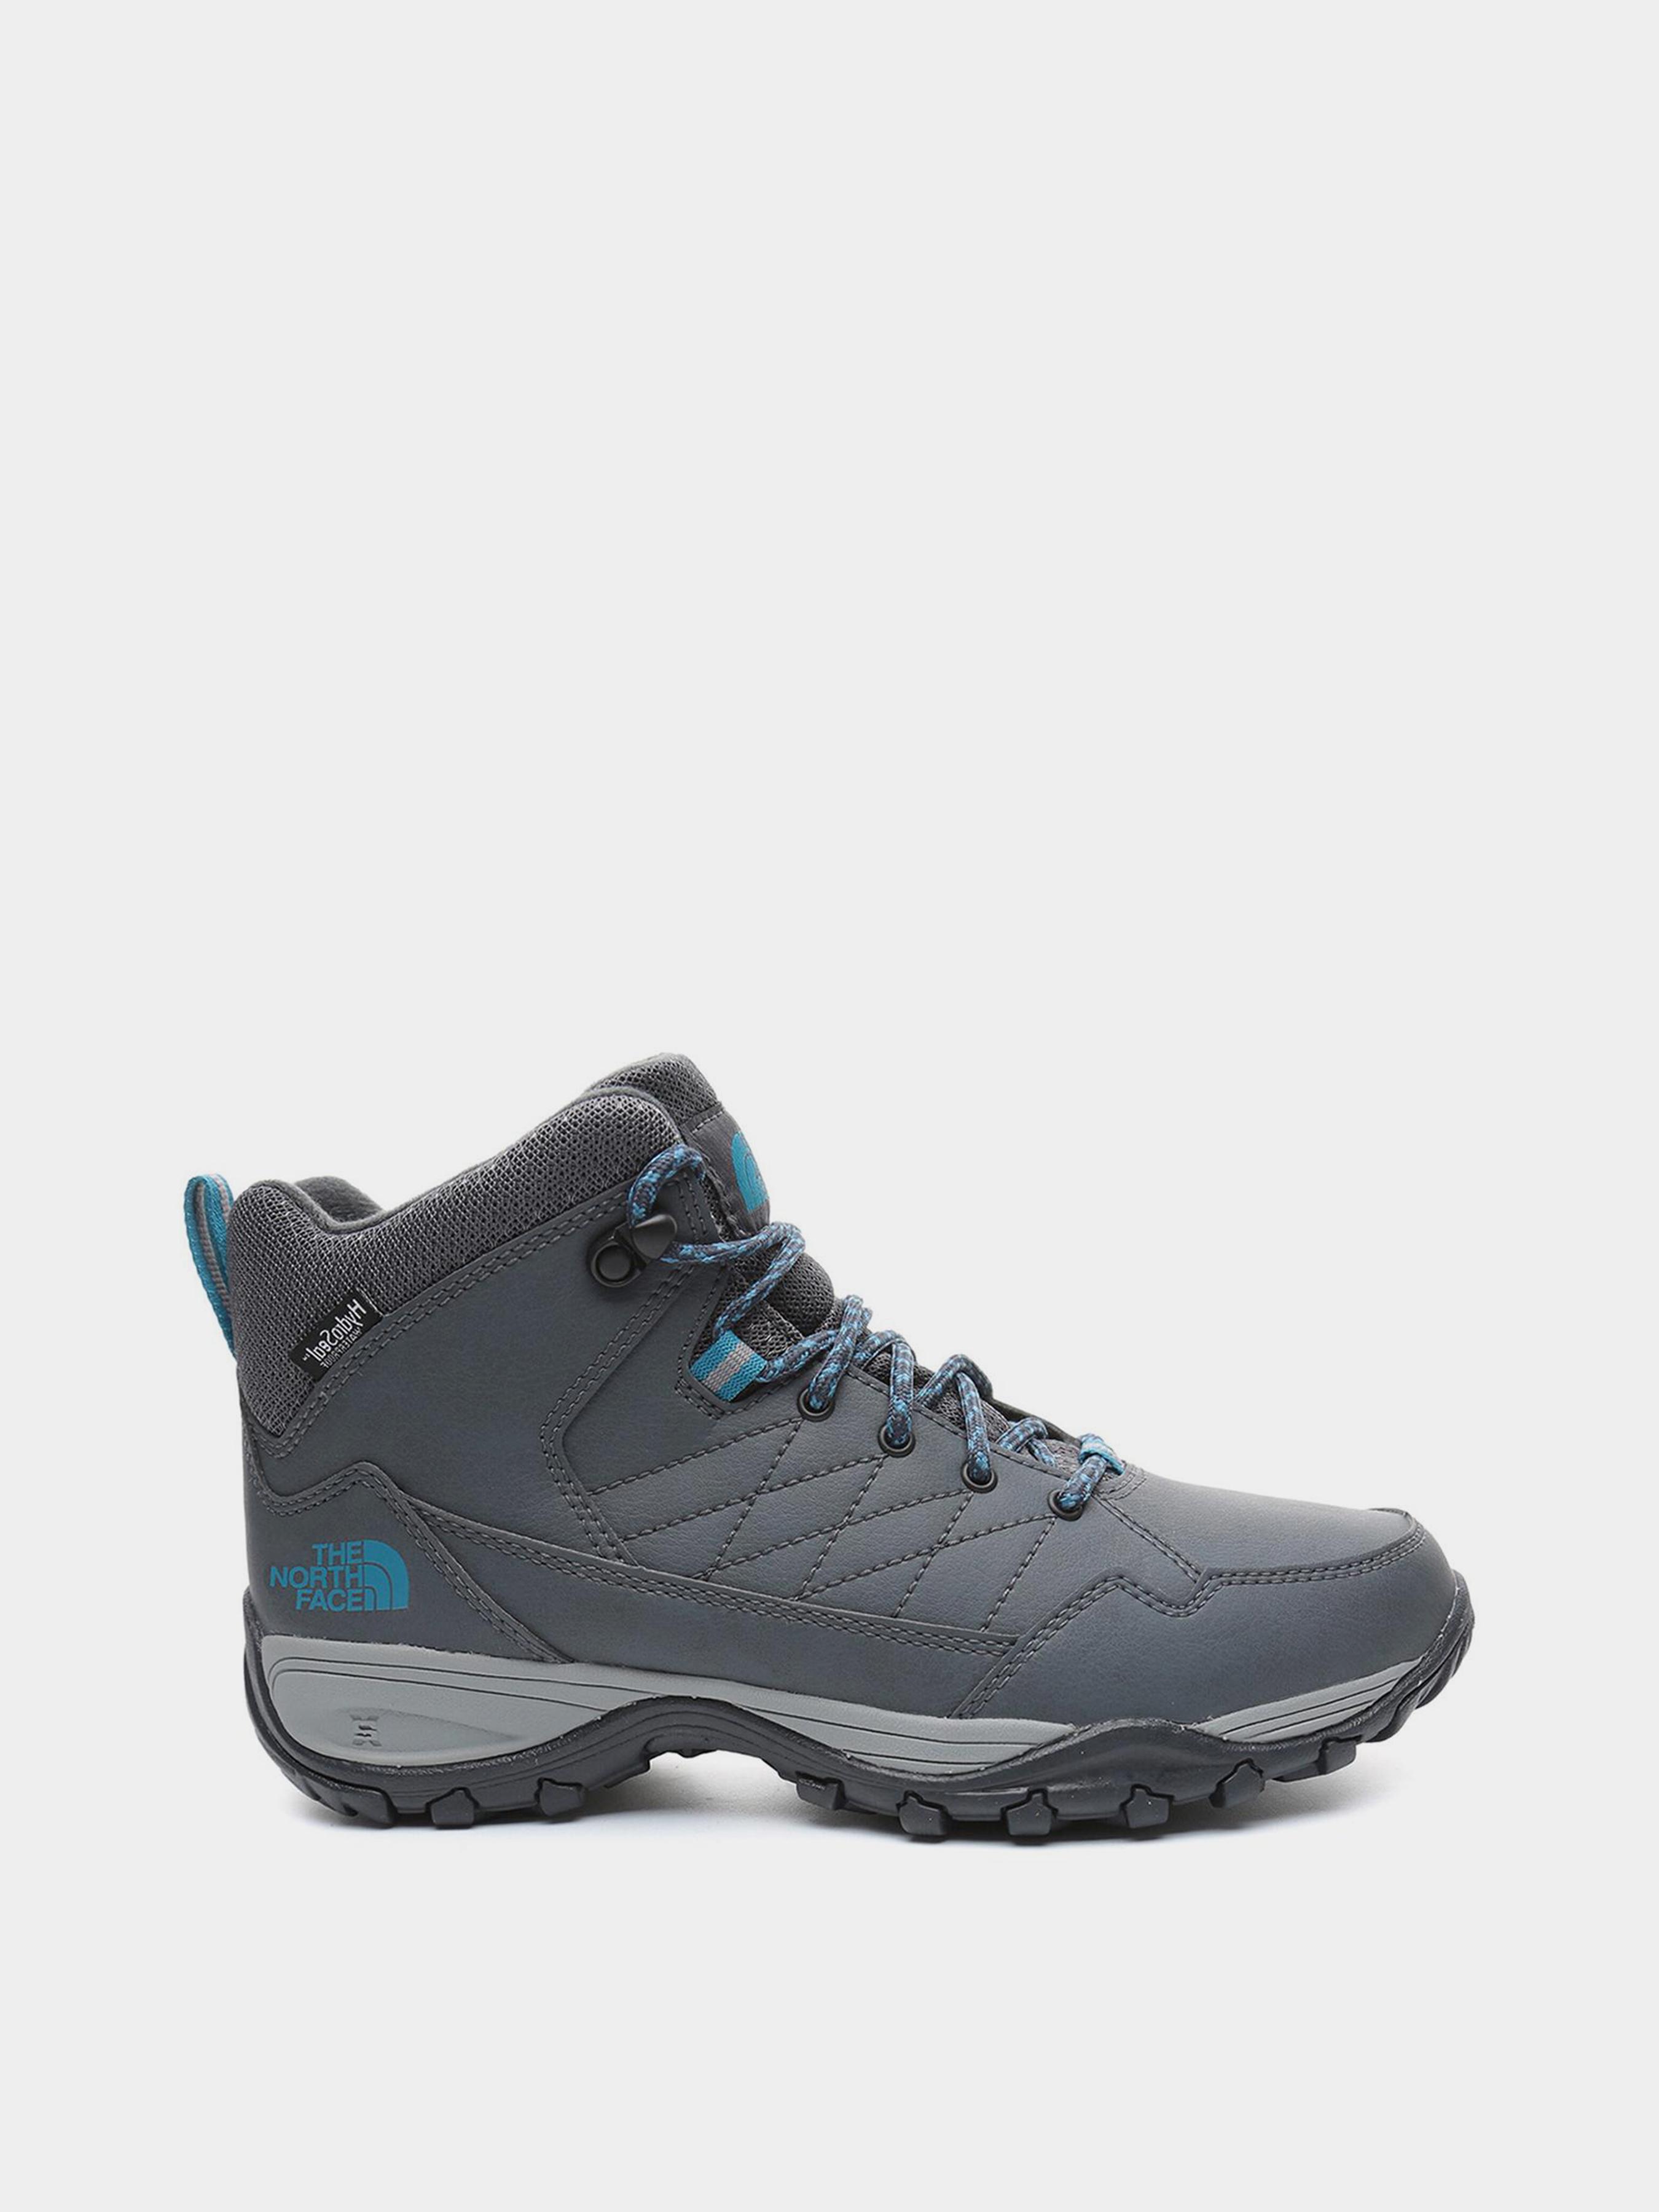 Ботинки для женщин The North Face Storm Strike II Wp NO9786 размерная сетка обуви, 2017